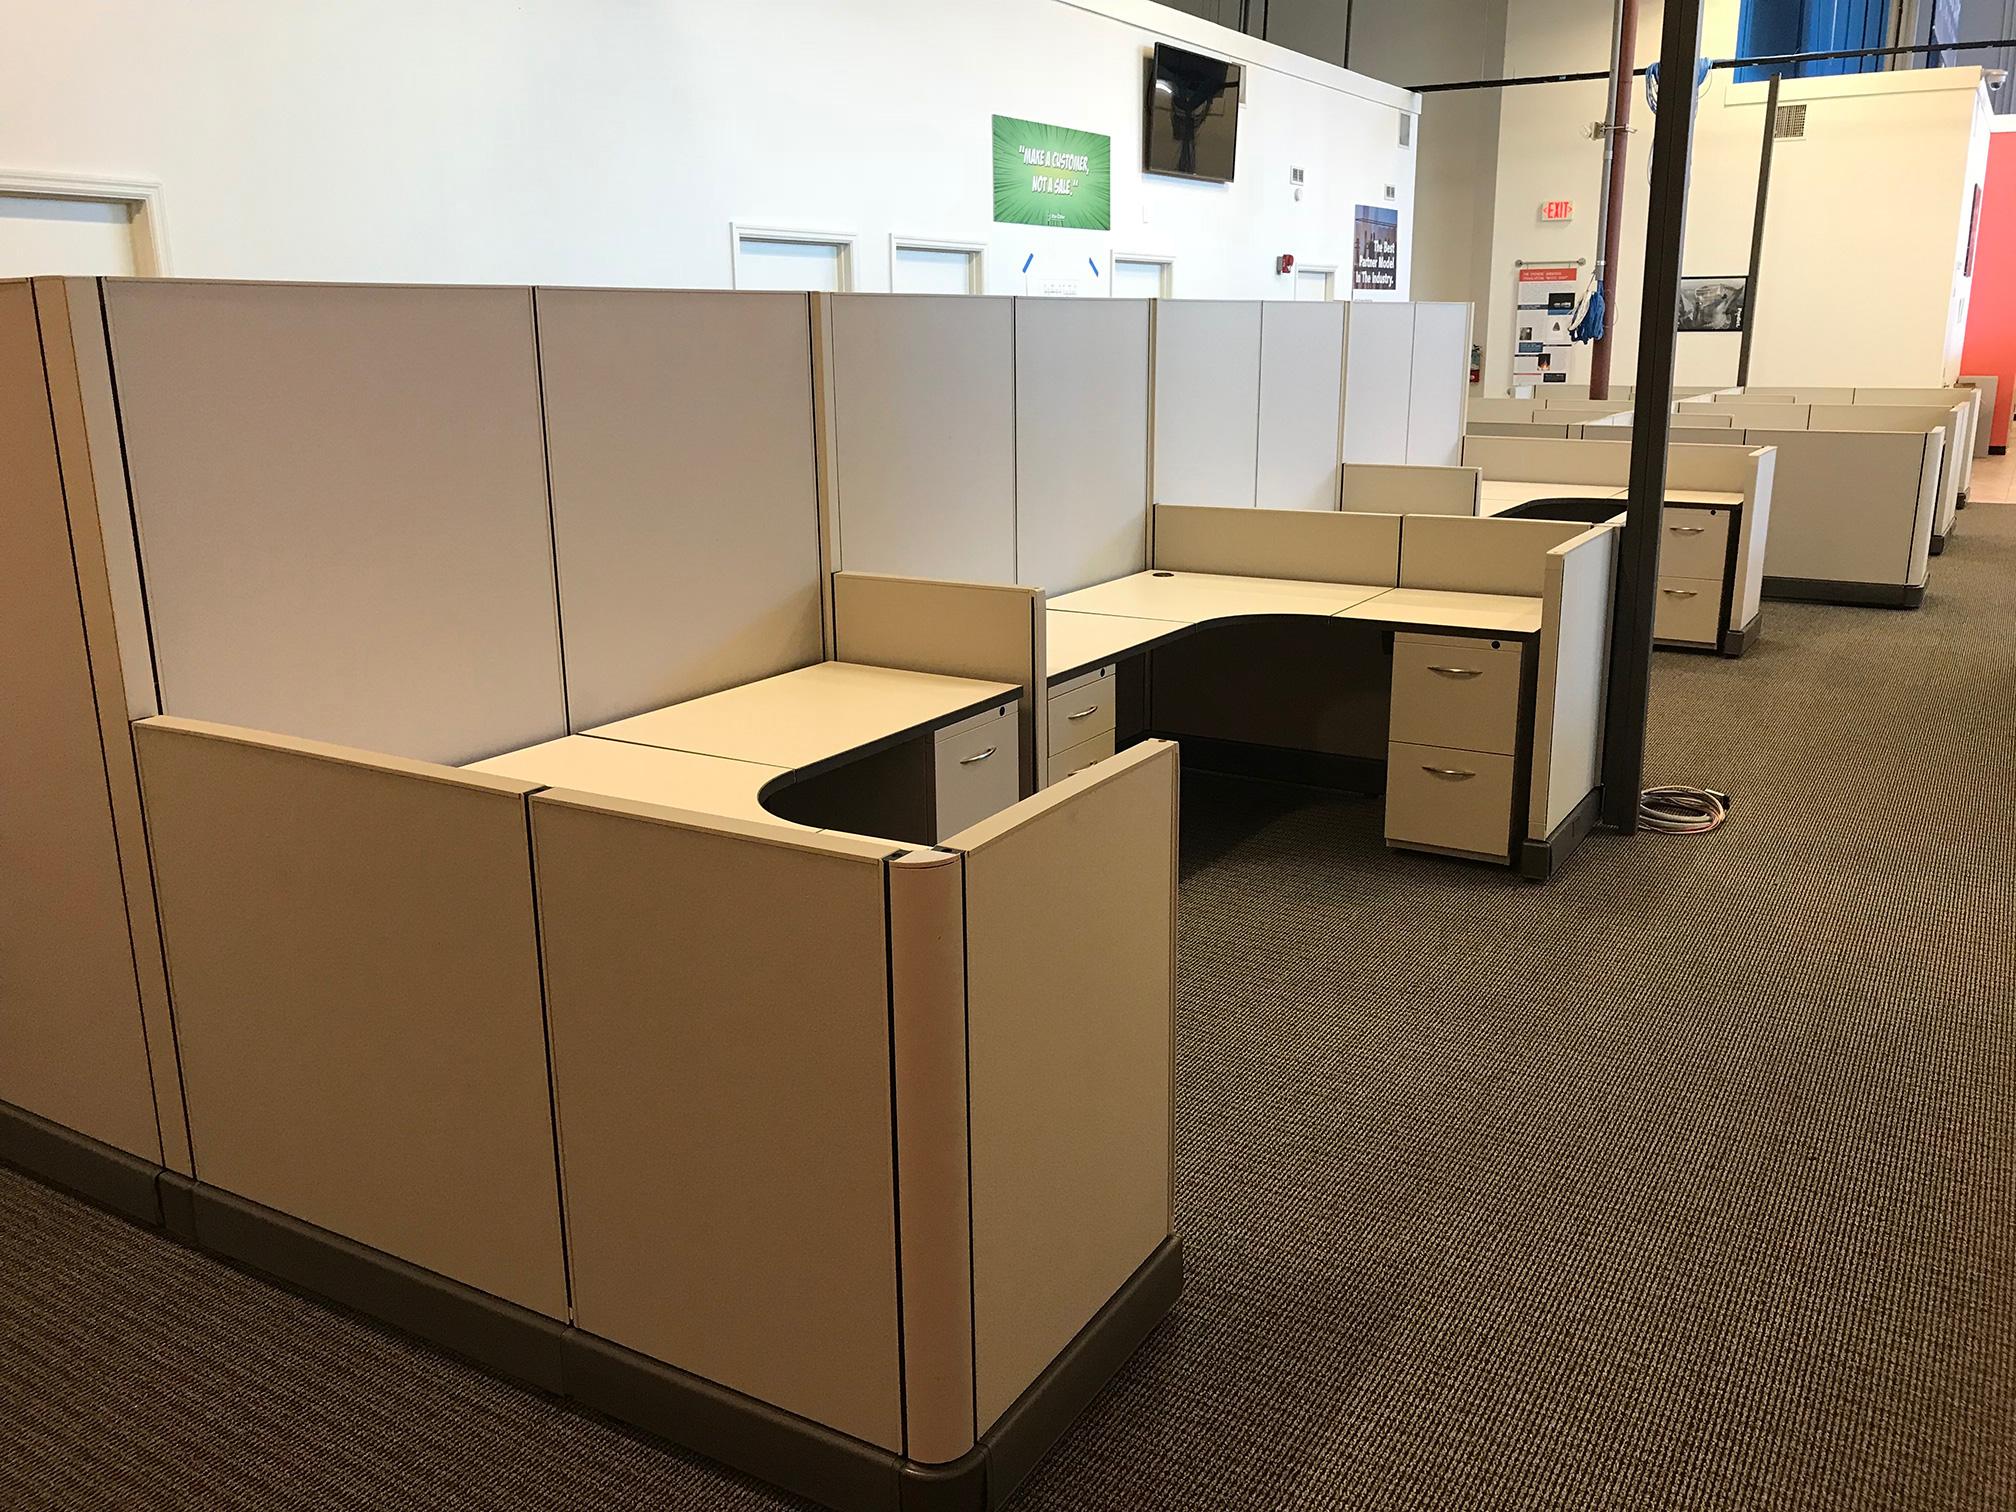 cubicle-reconfiguration-manasota-office-supplies-llc.jpg